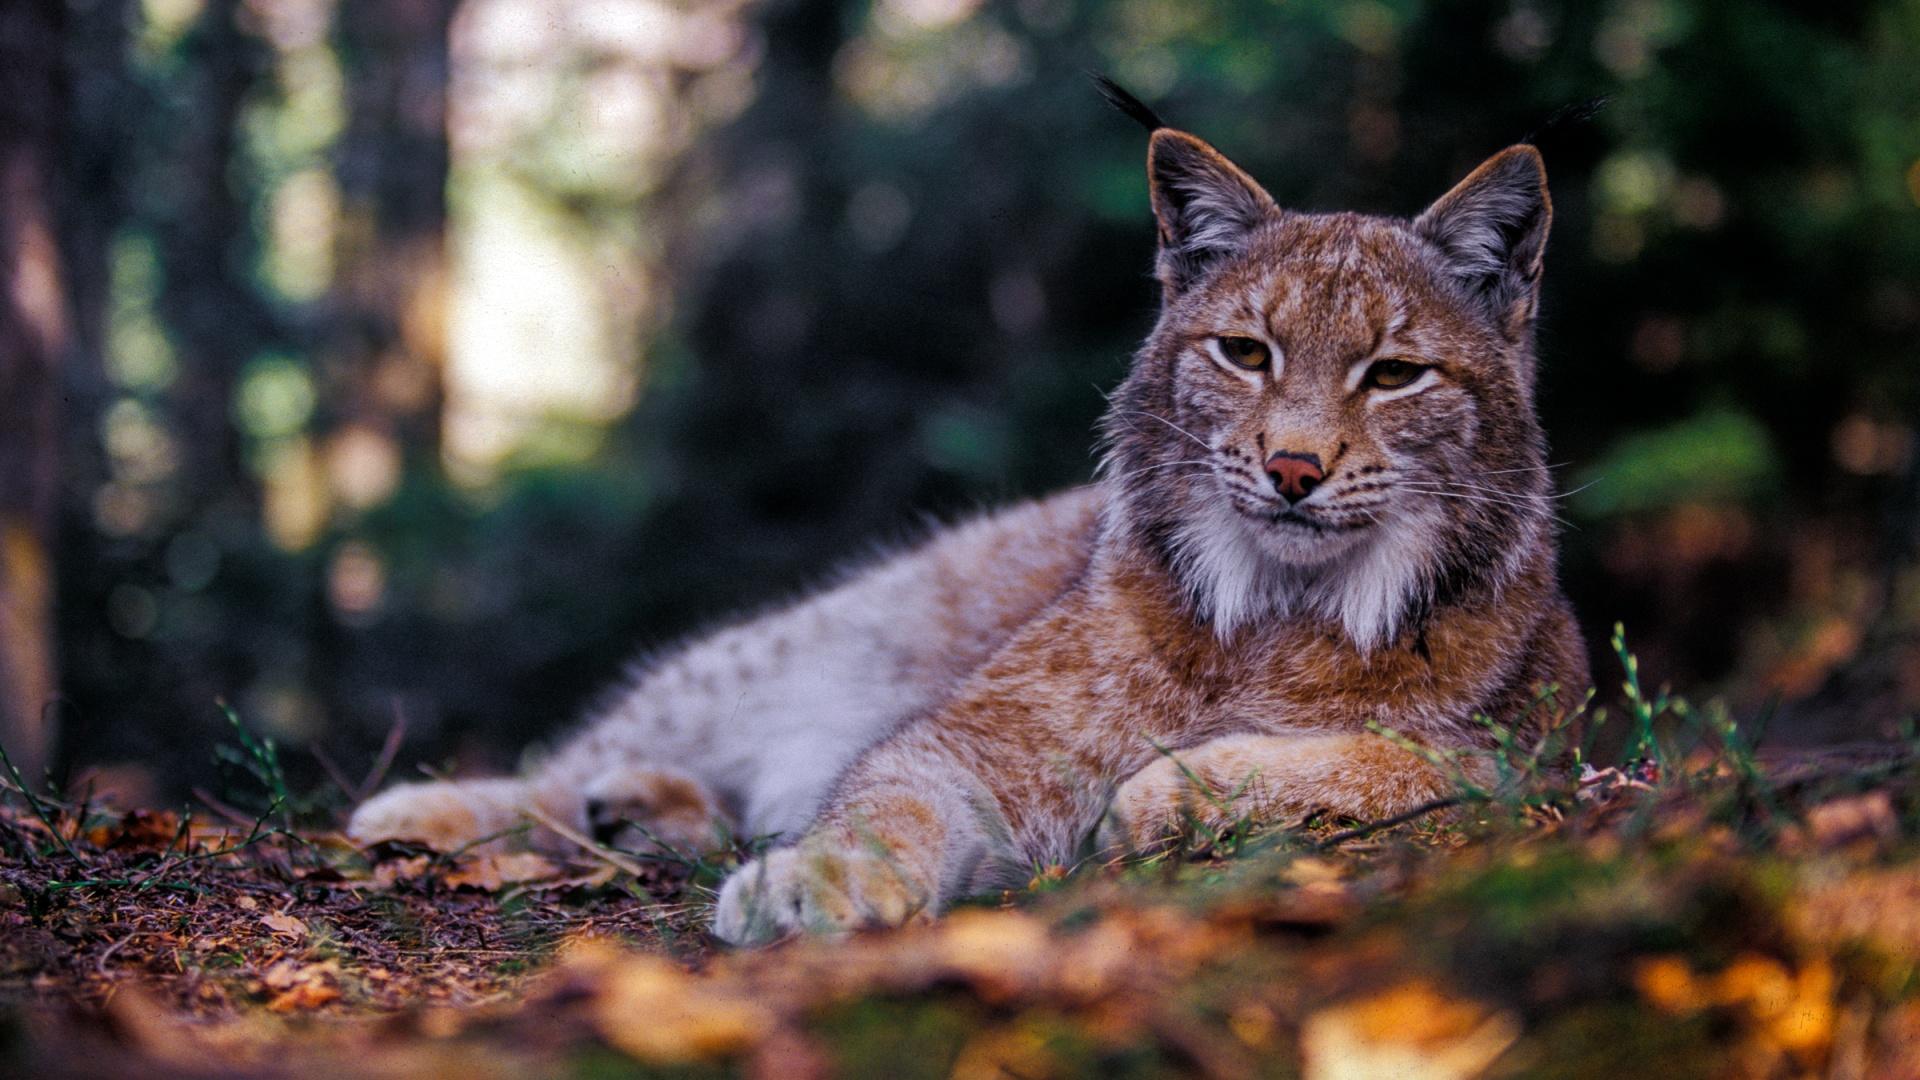 eurasian-lynx-forest-national-park-slovakia-tomas-hulik-wwf-1920x1080